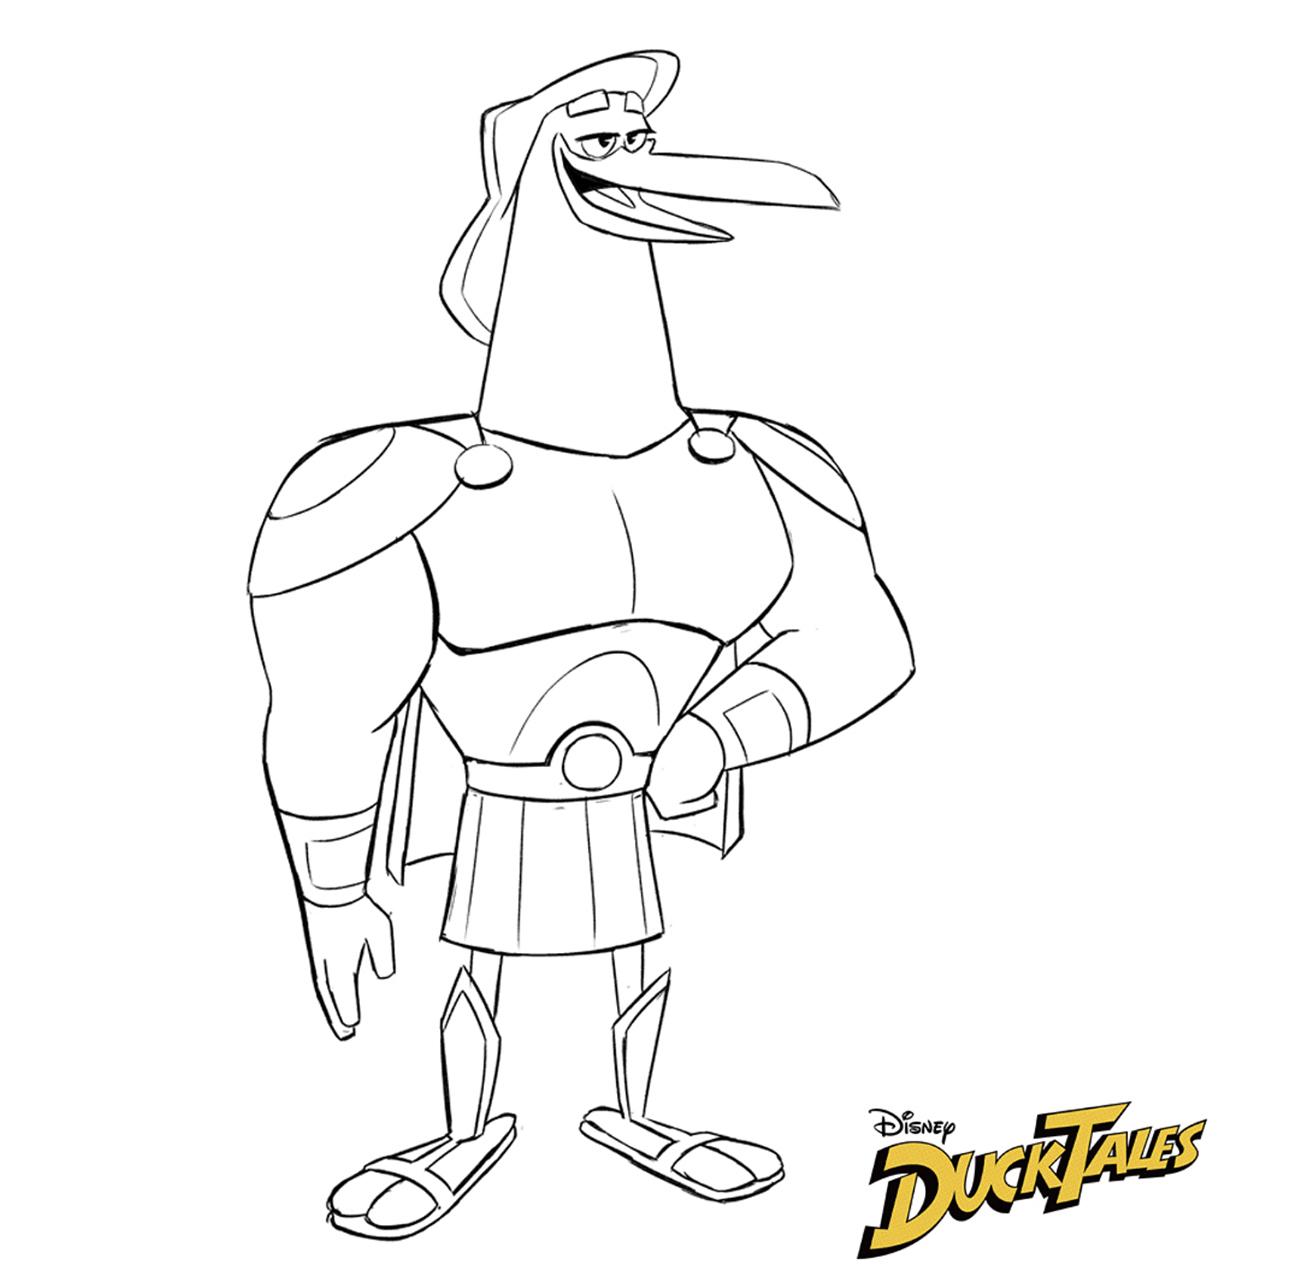 DuckTalesNew - 69.jpg